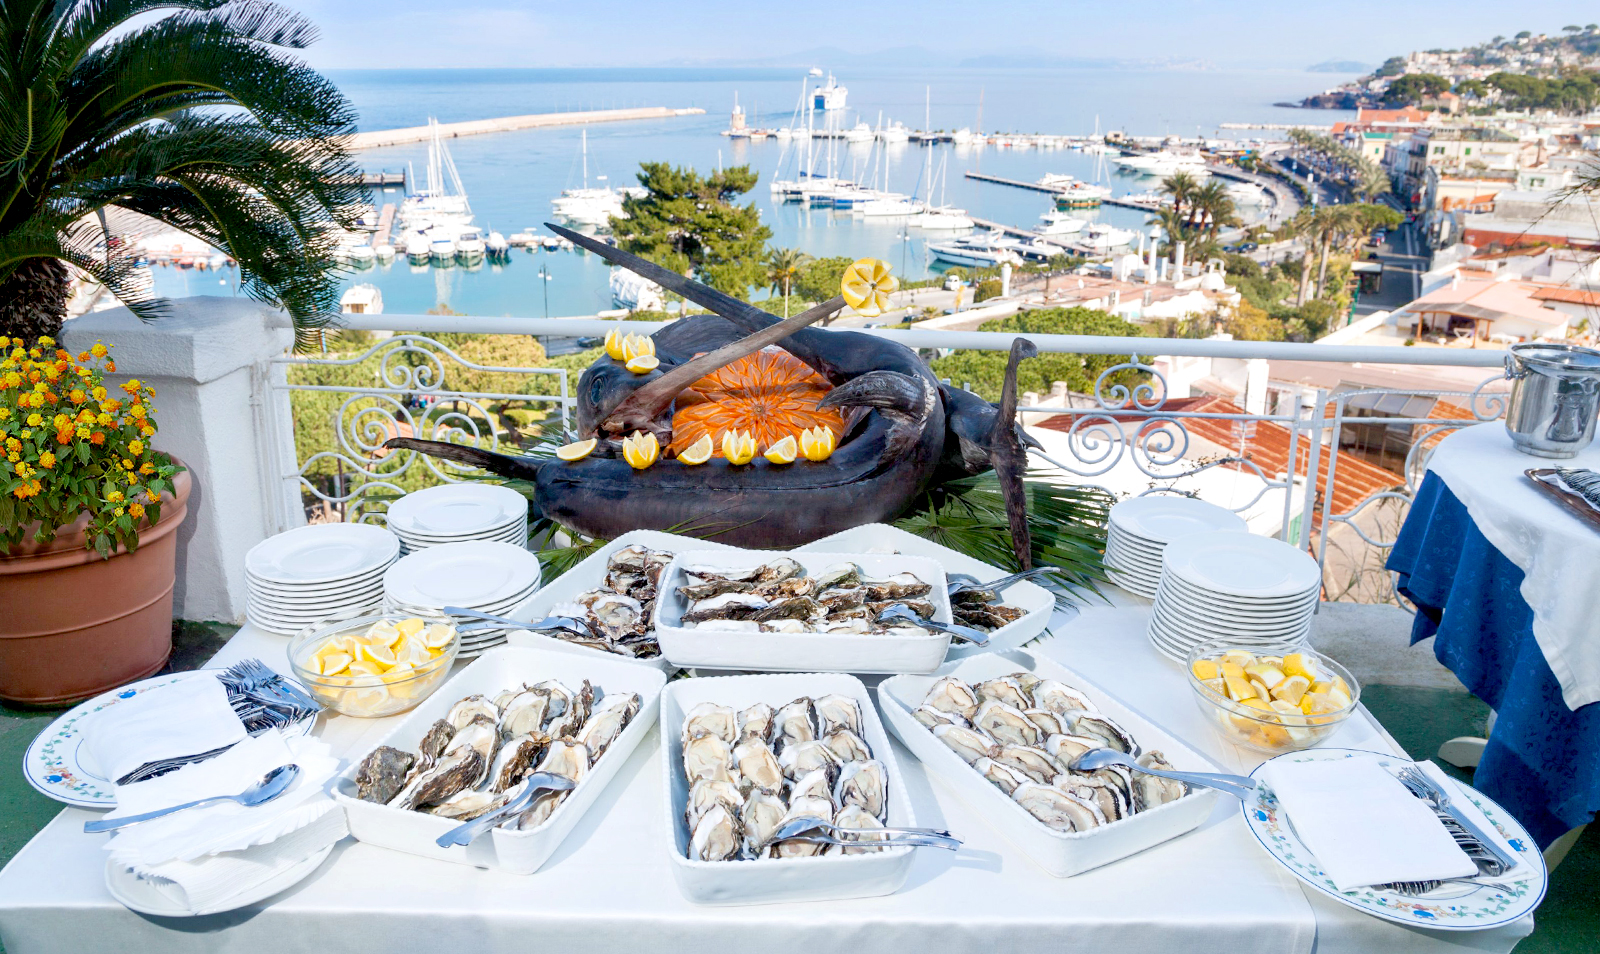 hotel-terme-gran-paradiso-ischia-casamicciola-buffet-terrazzo